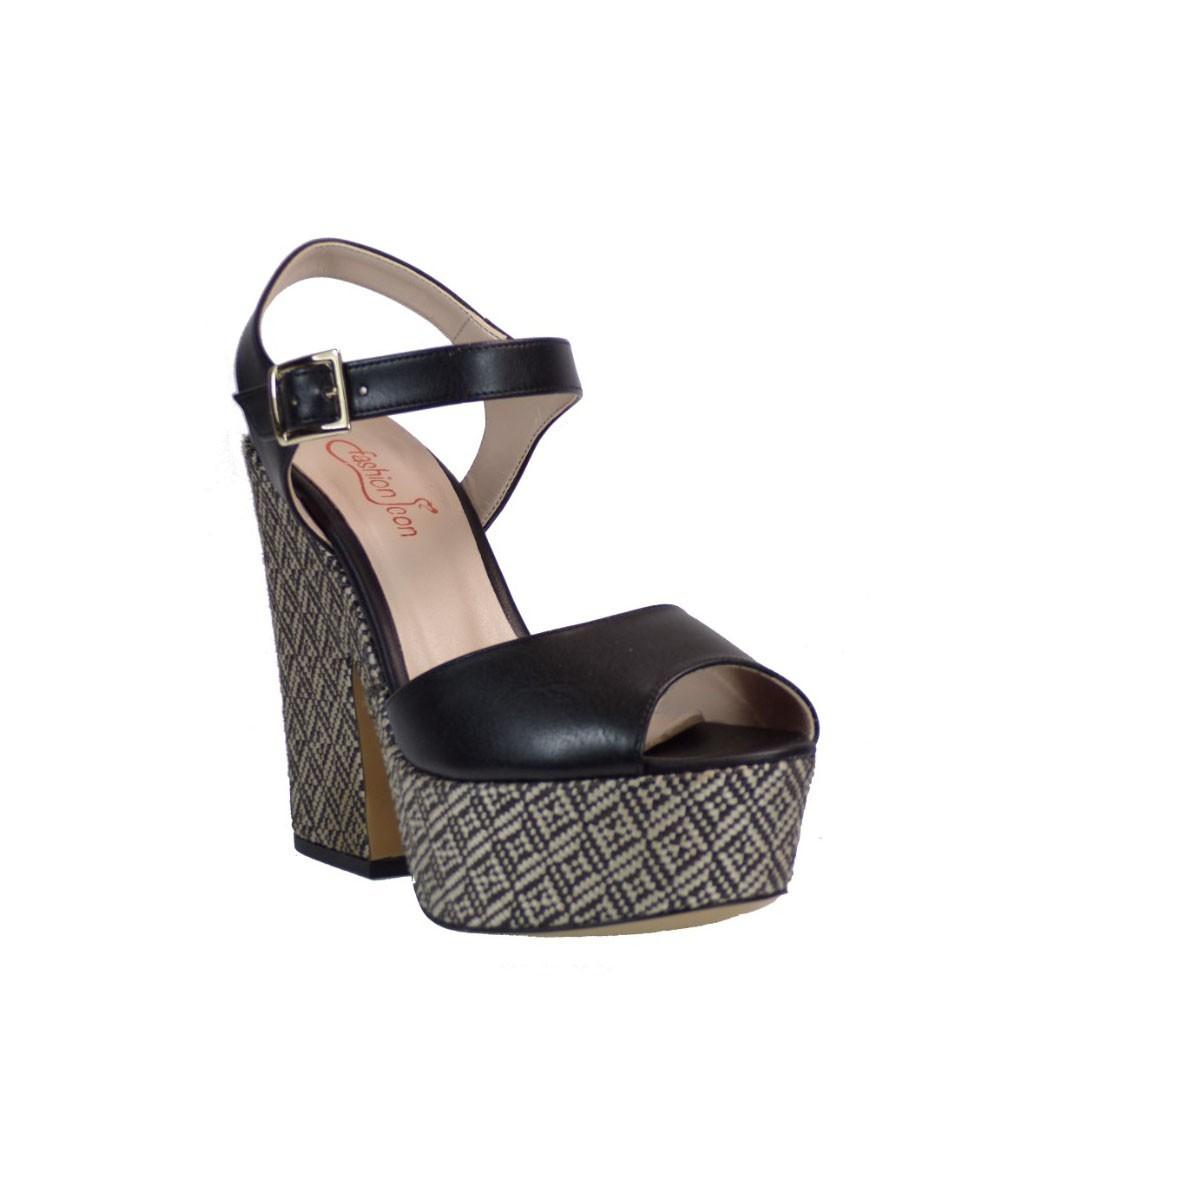 Fashion Icon Γυναικεία Παπούτσια Πέδιλα F09-05653 Μαύρο